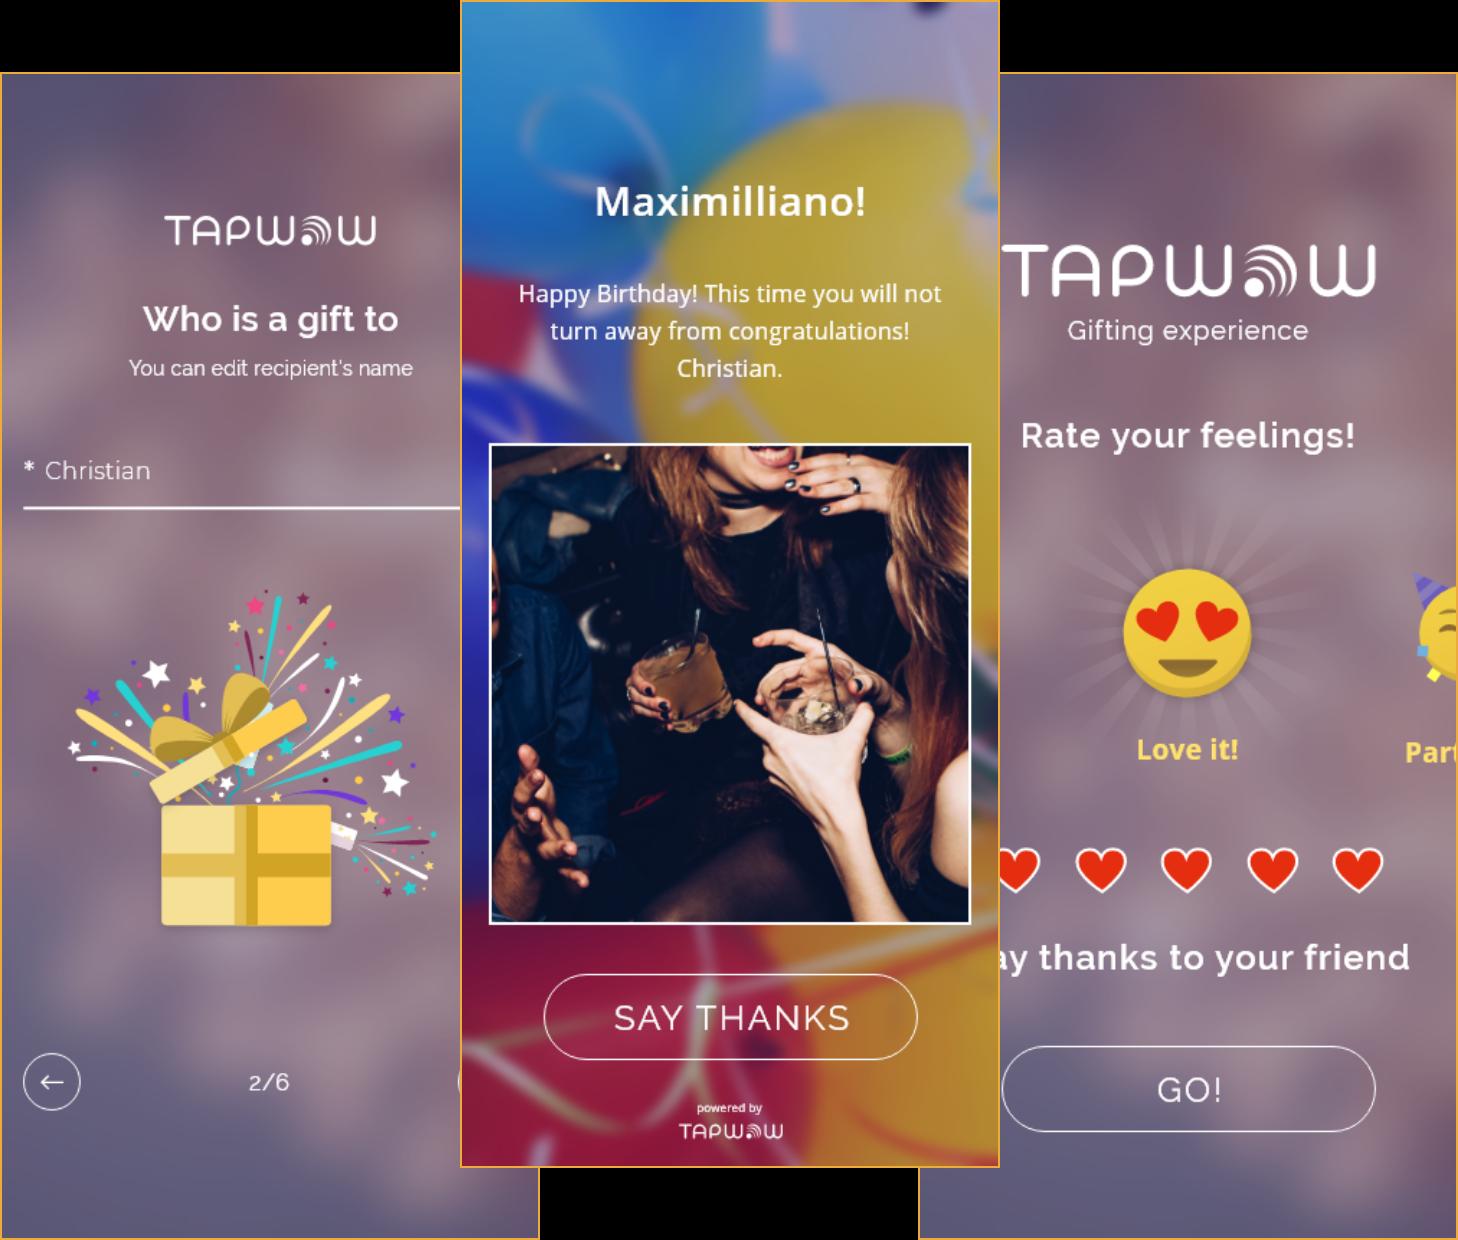 tapwow application screens